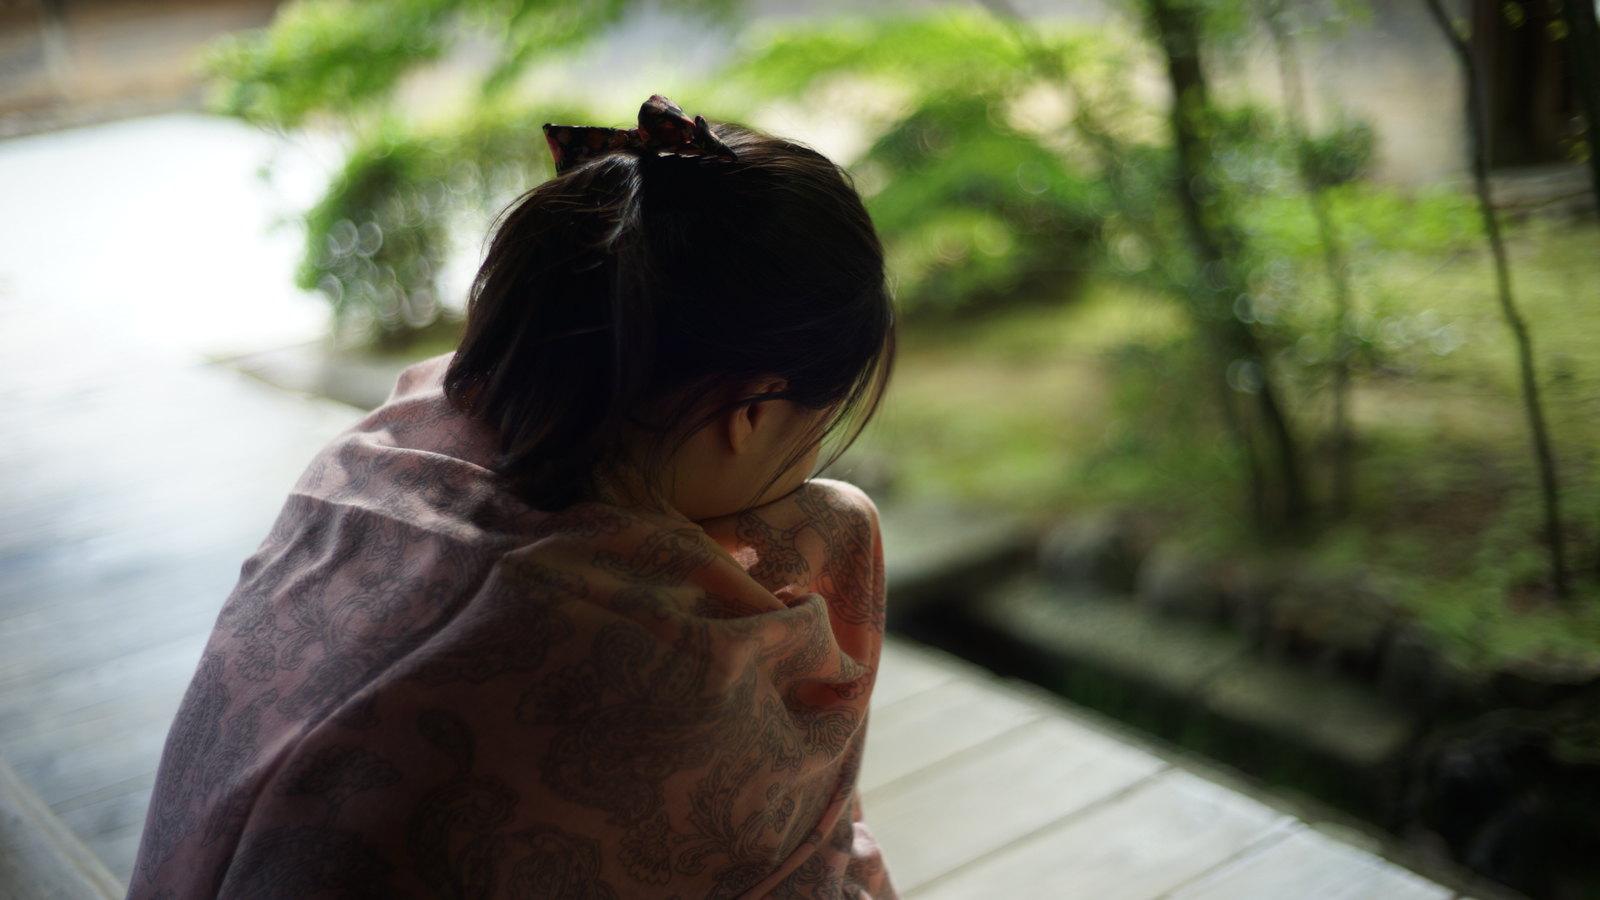 Sad girl at the Zen Garden. #Kyoto #japan15 #SonyA7 #Voigtlander40mm #ryoanji